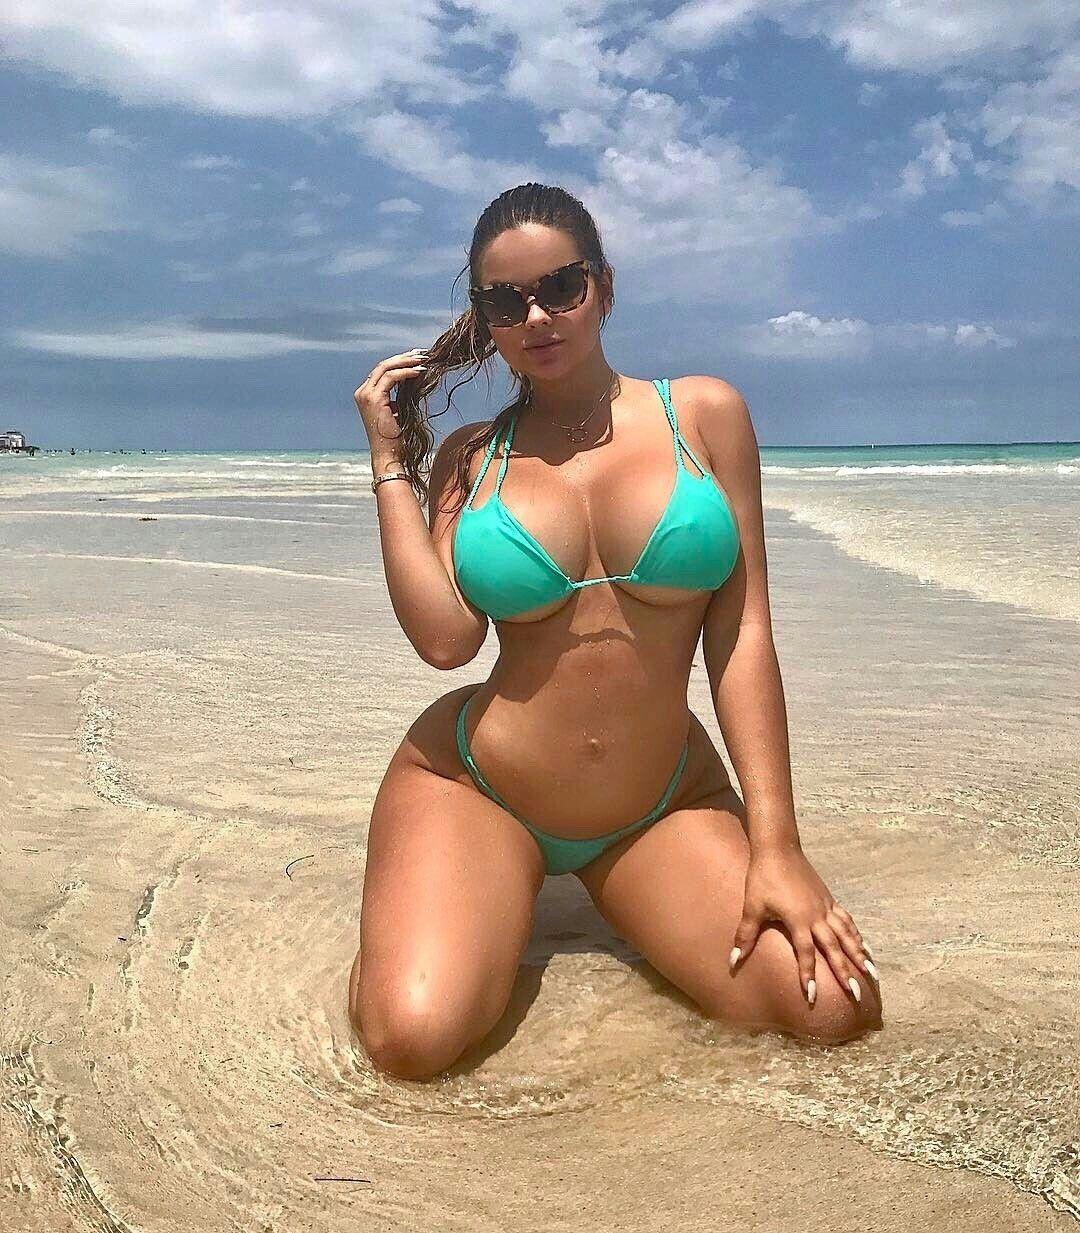 Sexy bikini babes on the beach, hot michigan women nude